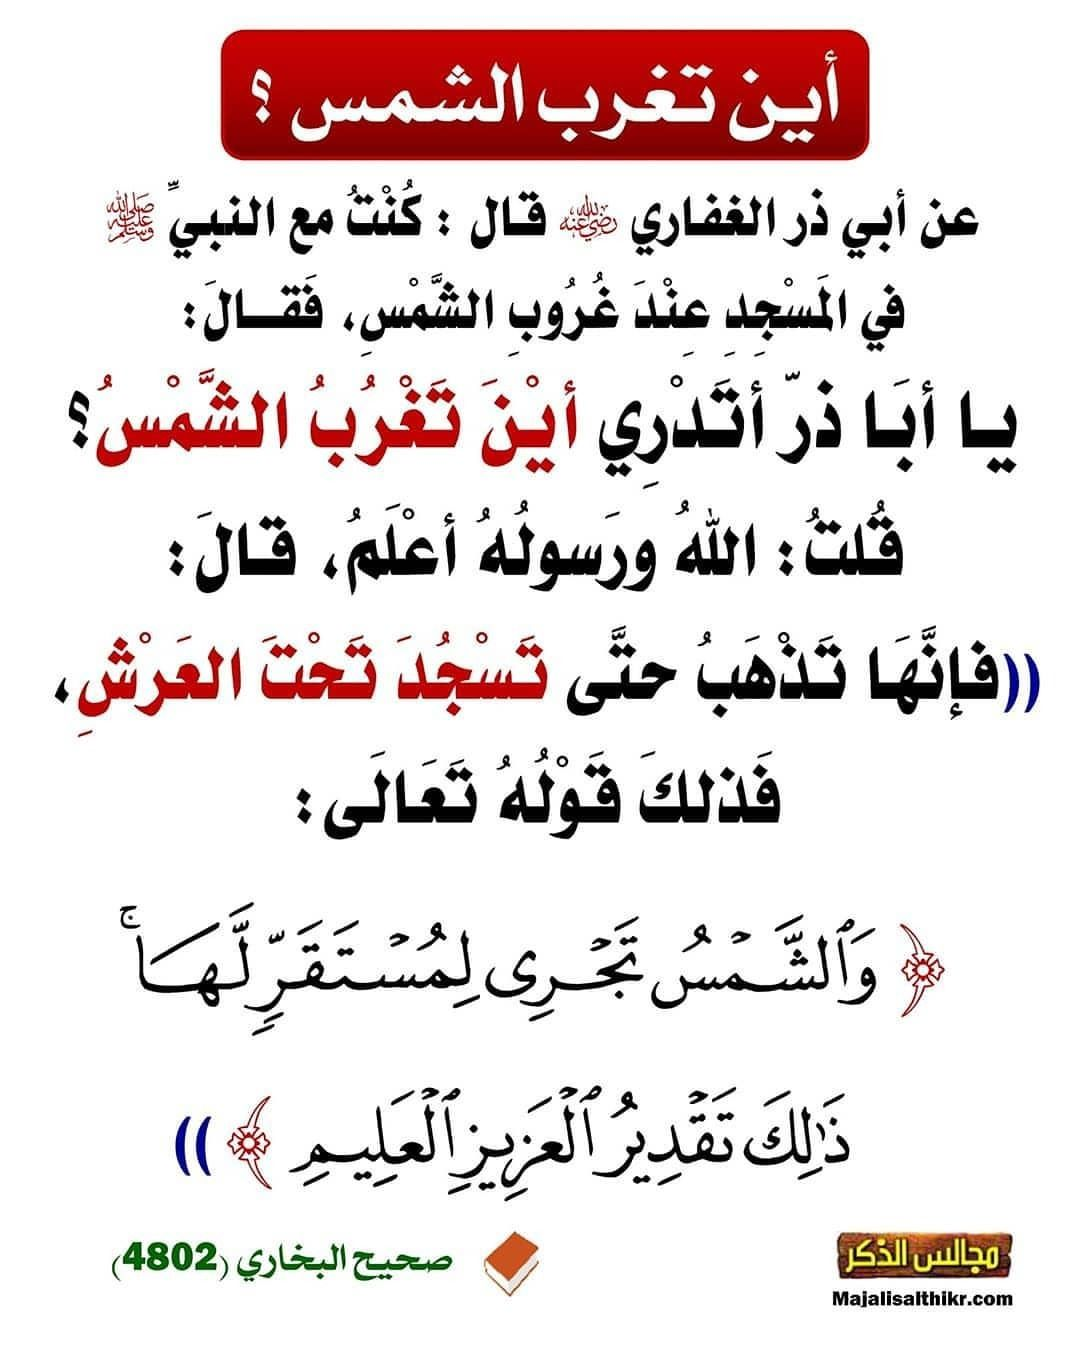 صفحة المسلم Islamic Phrases Islamic Quotes Words Quotes